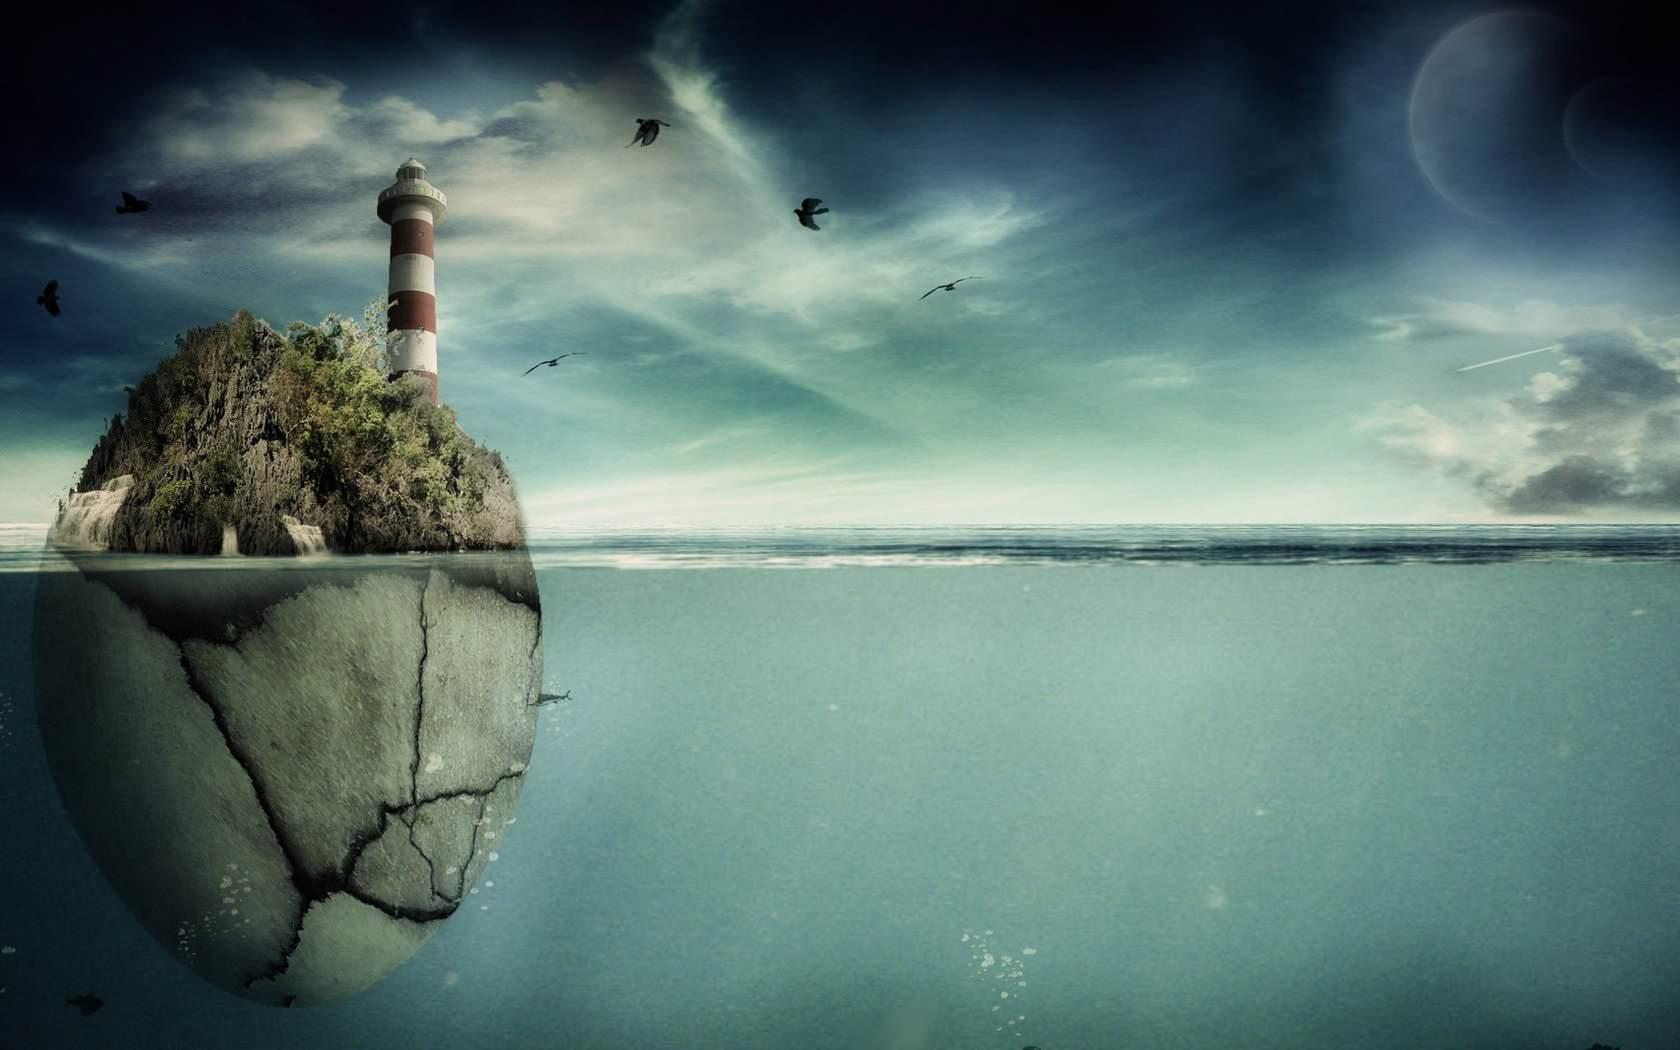 Digital Lighthouse Wallpaper